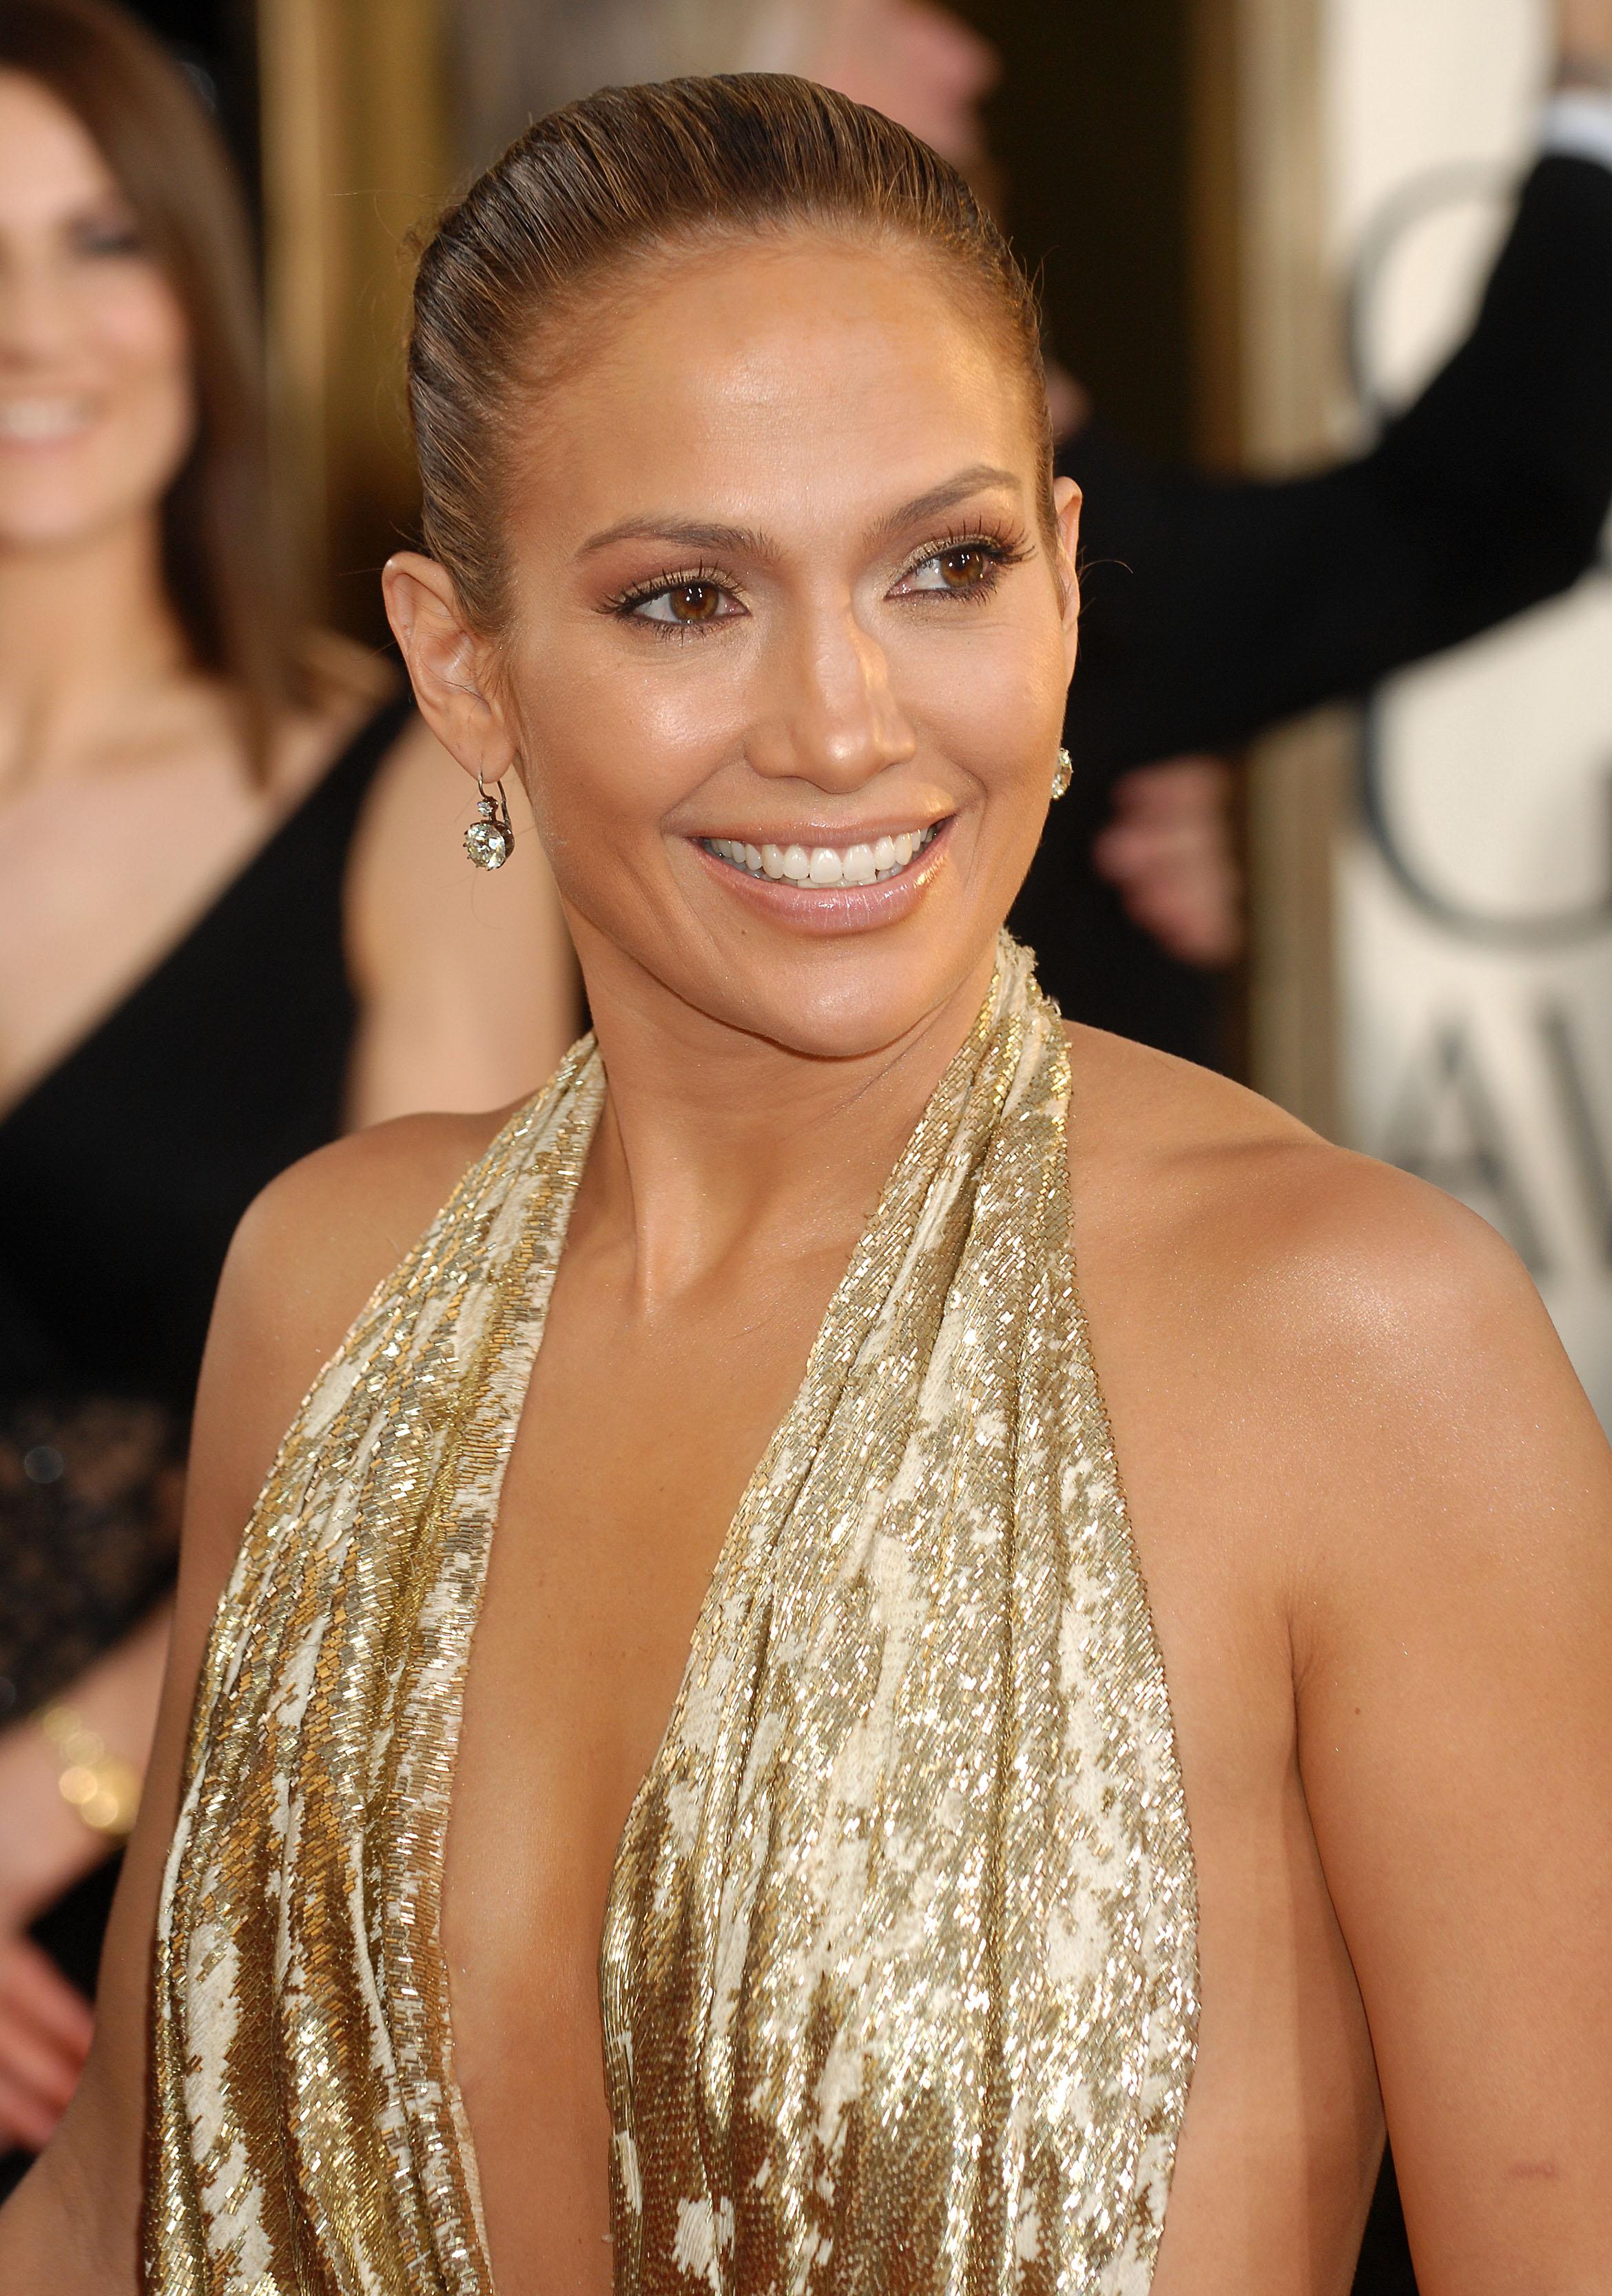 29235_Celebutopia-Jennifer_Lopez_arrives_at_the_66th_Annual_Golden_Globe_Awards-04_122_1133lo.JPG